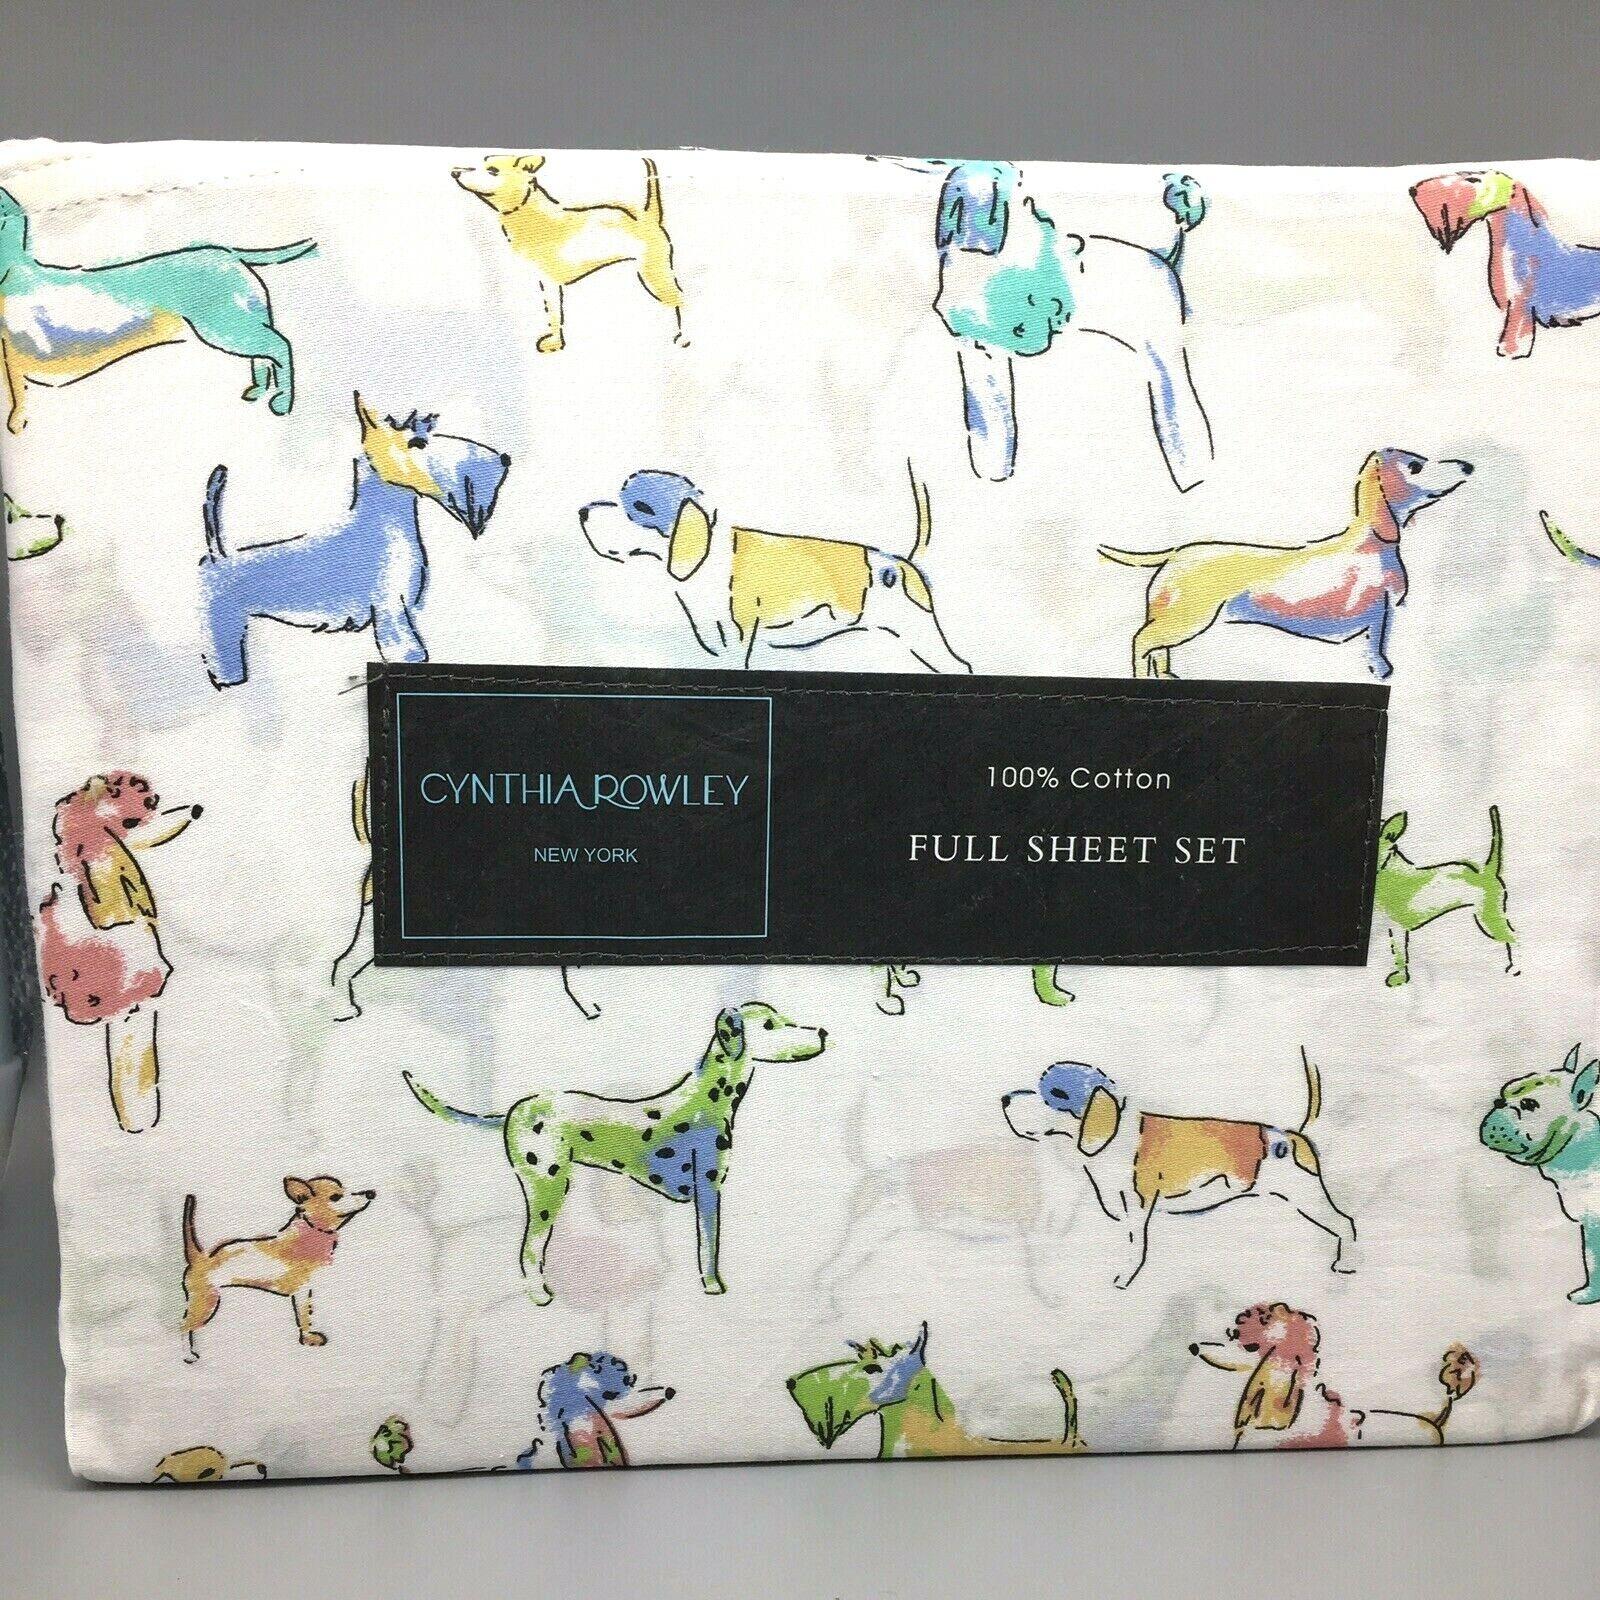 4pc Cynthia Rowley WaterFarbe Dog FULL Sheet Set Farbeful Dachshund 100% Cotton